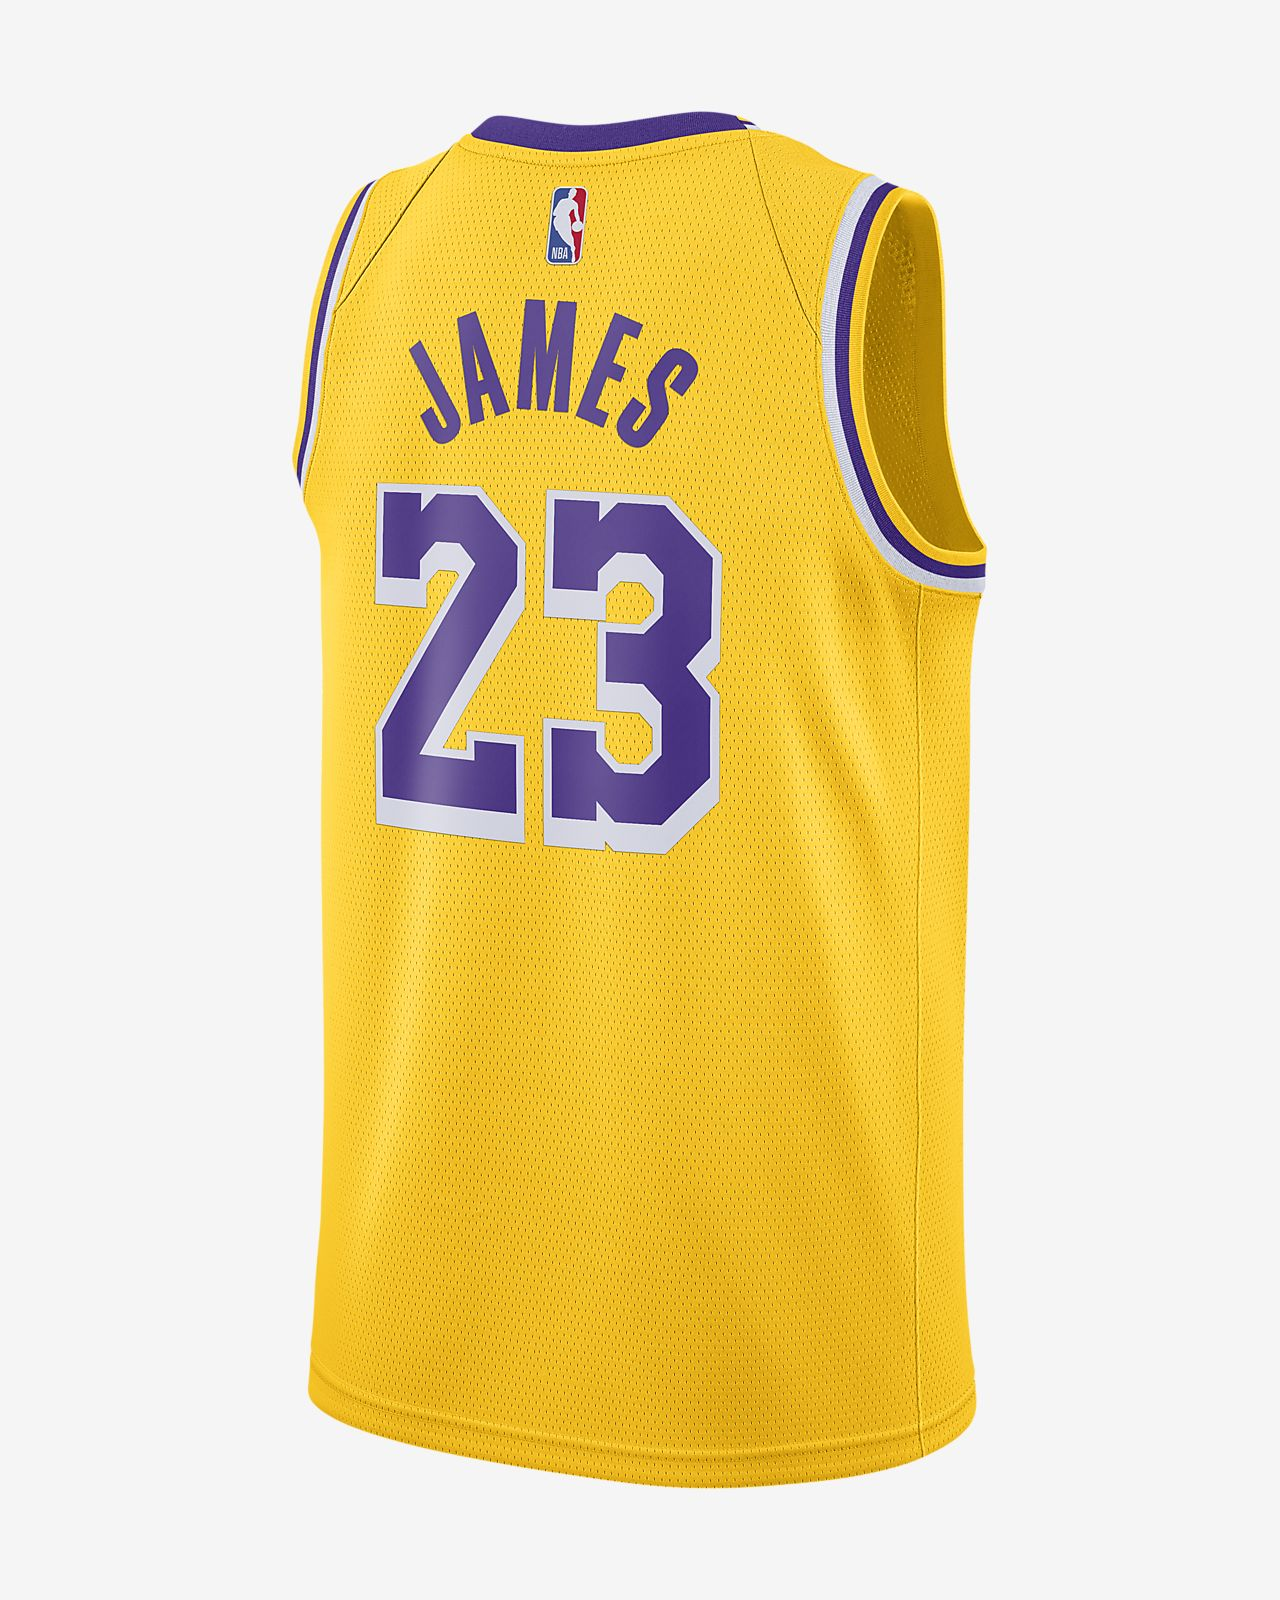 111341ae16c3 ... LeBron James Icon Edition Swingman (Los Angeles Lakers) Nike NBA  Connected Trikot für Herren